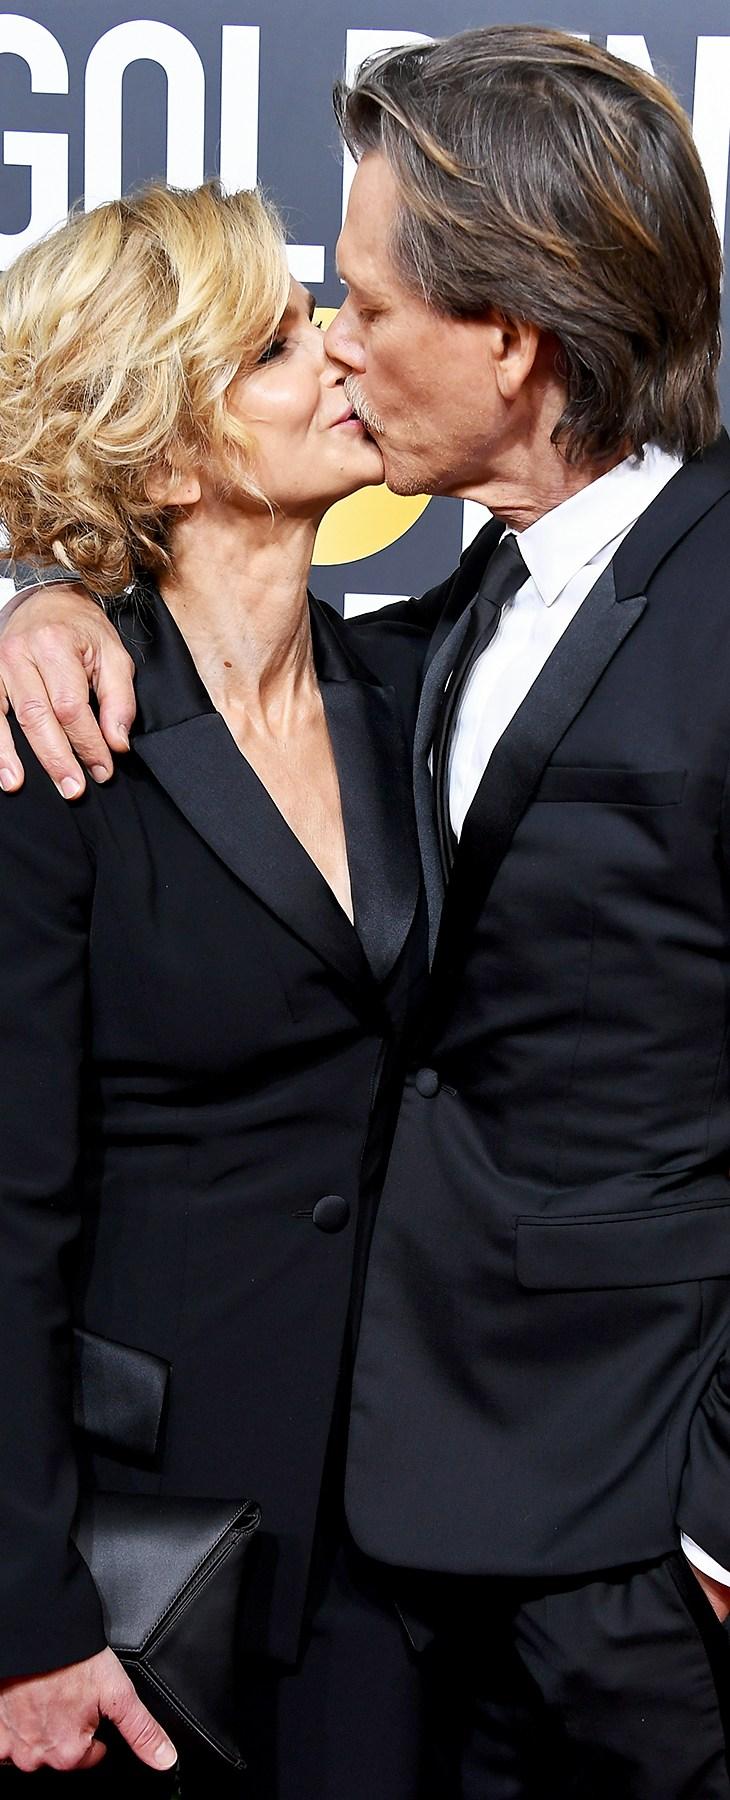 Kyra Sedgwick Kevin Bacon Golden Globes 2018 PDA